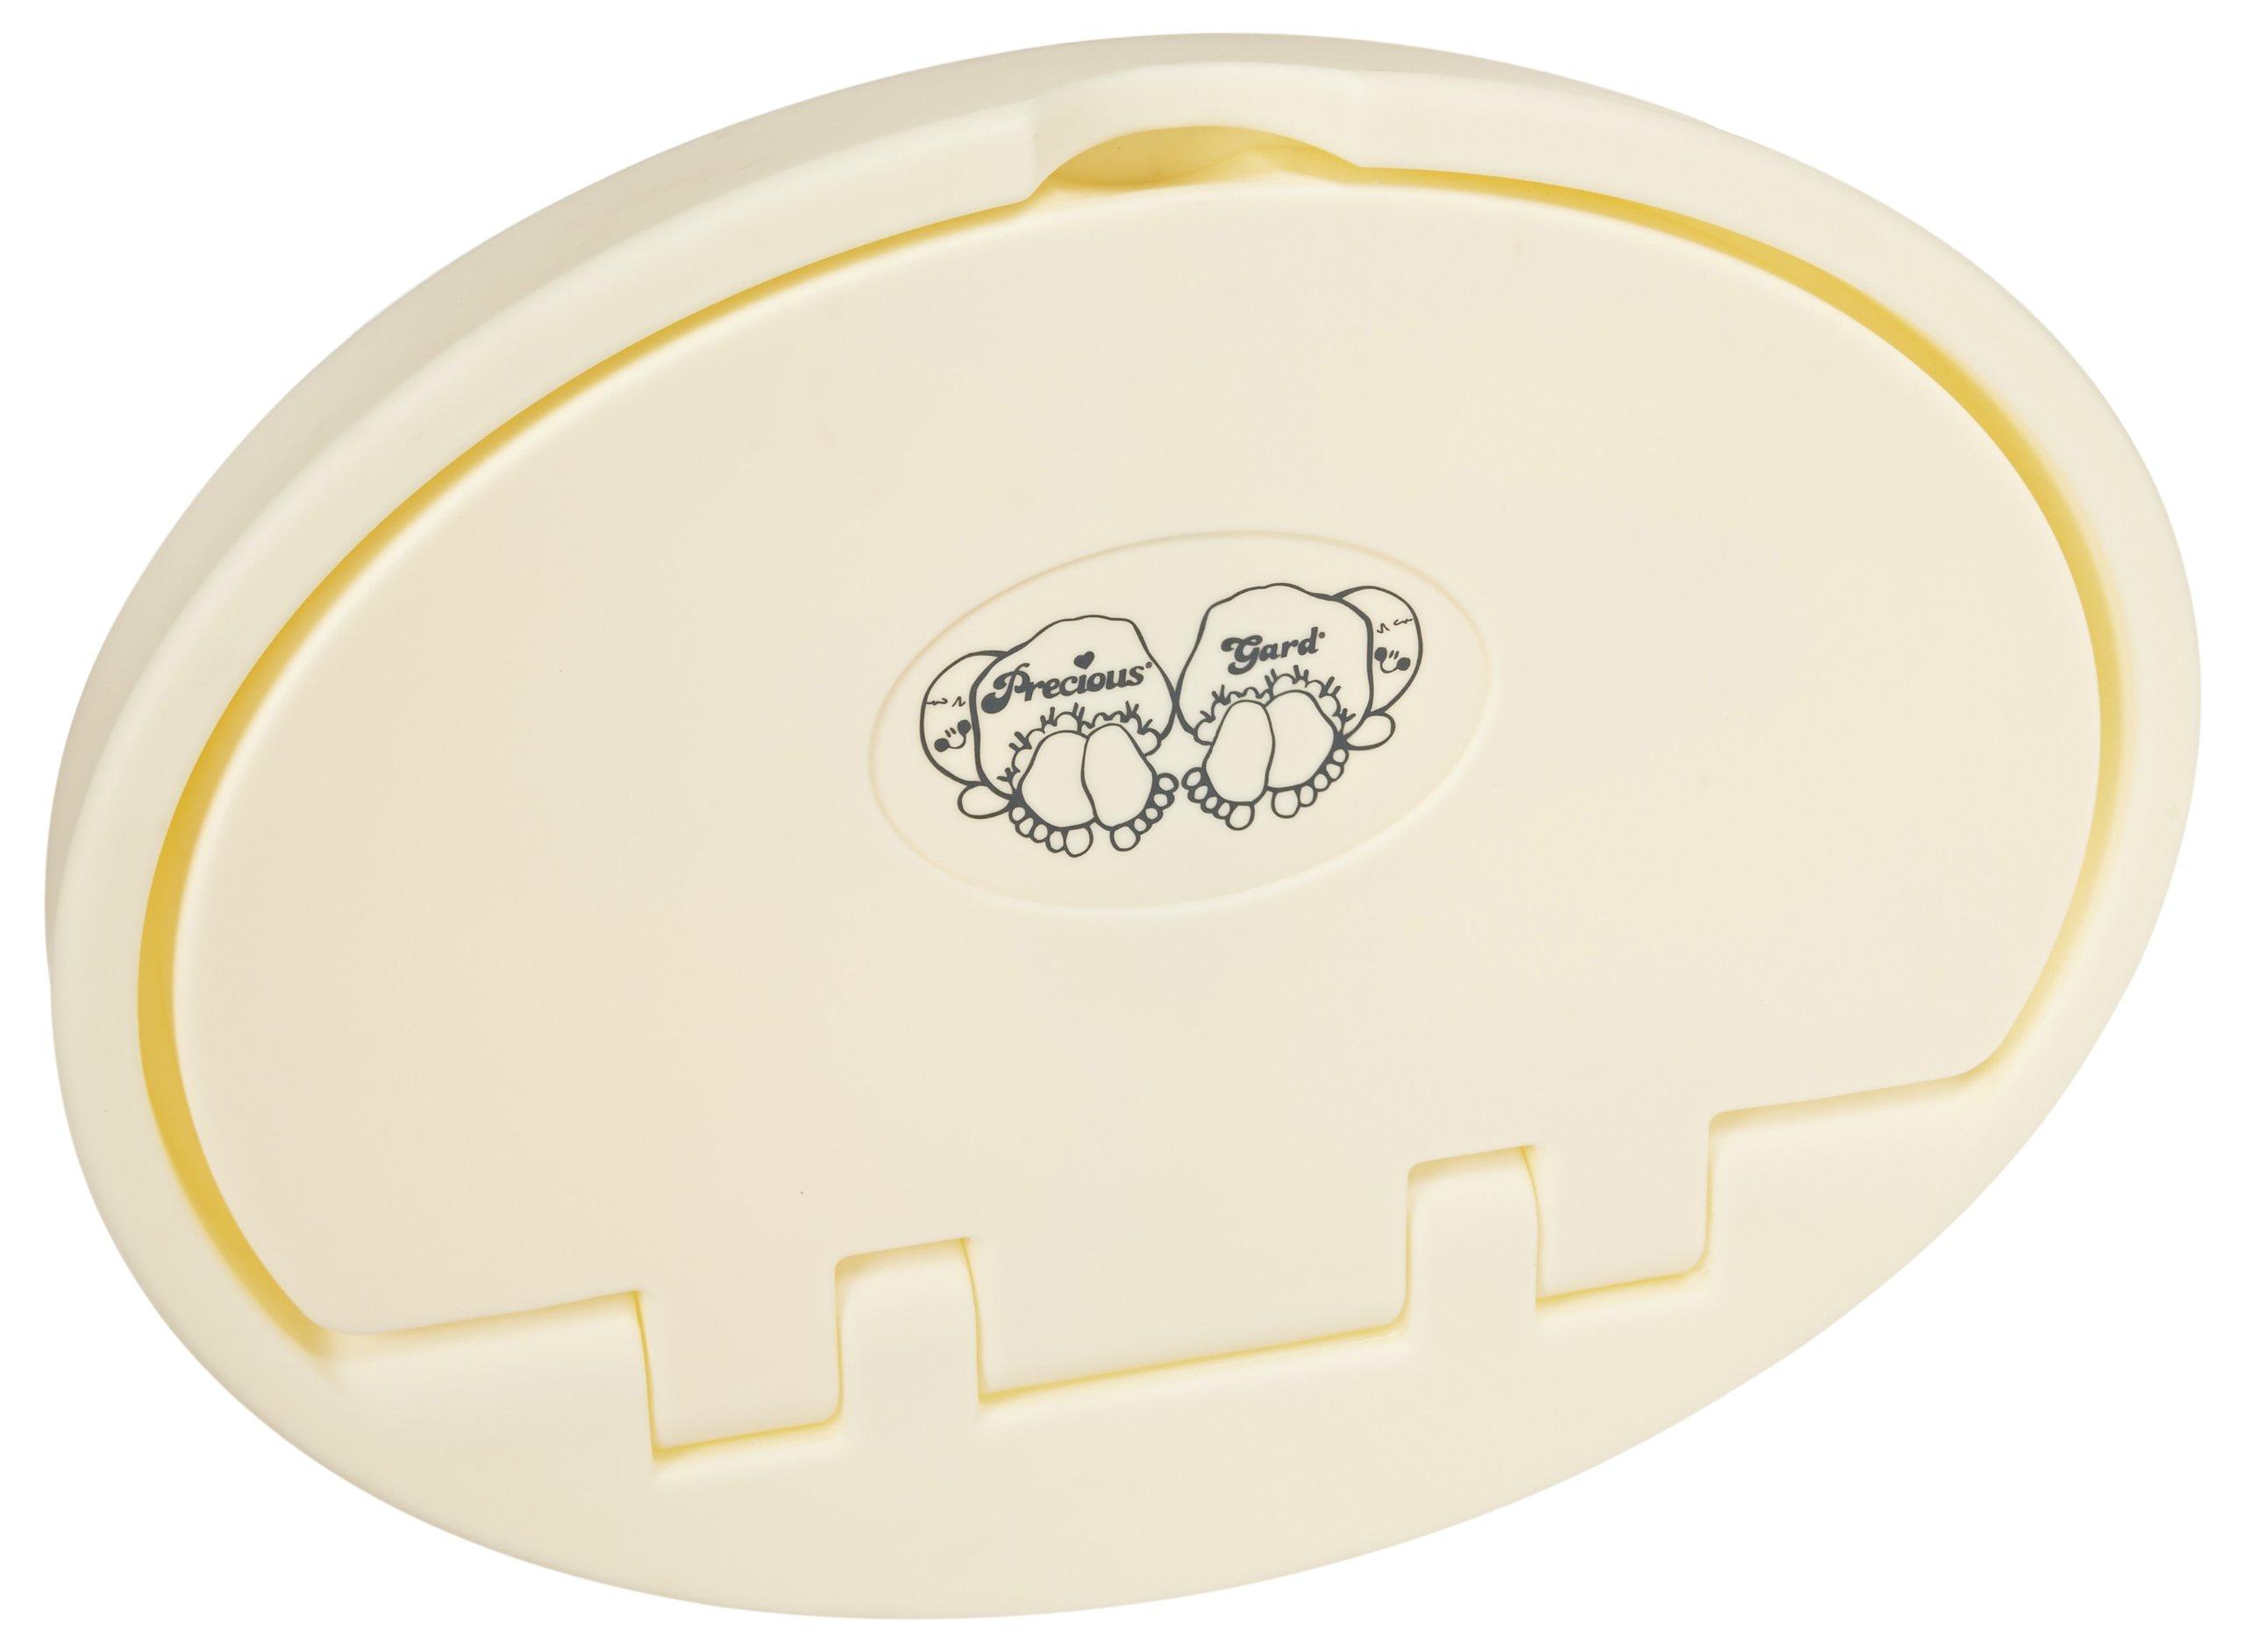 Precious Baby Changing Table, Hospeco 67016, White by Hospeco